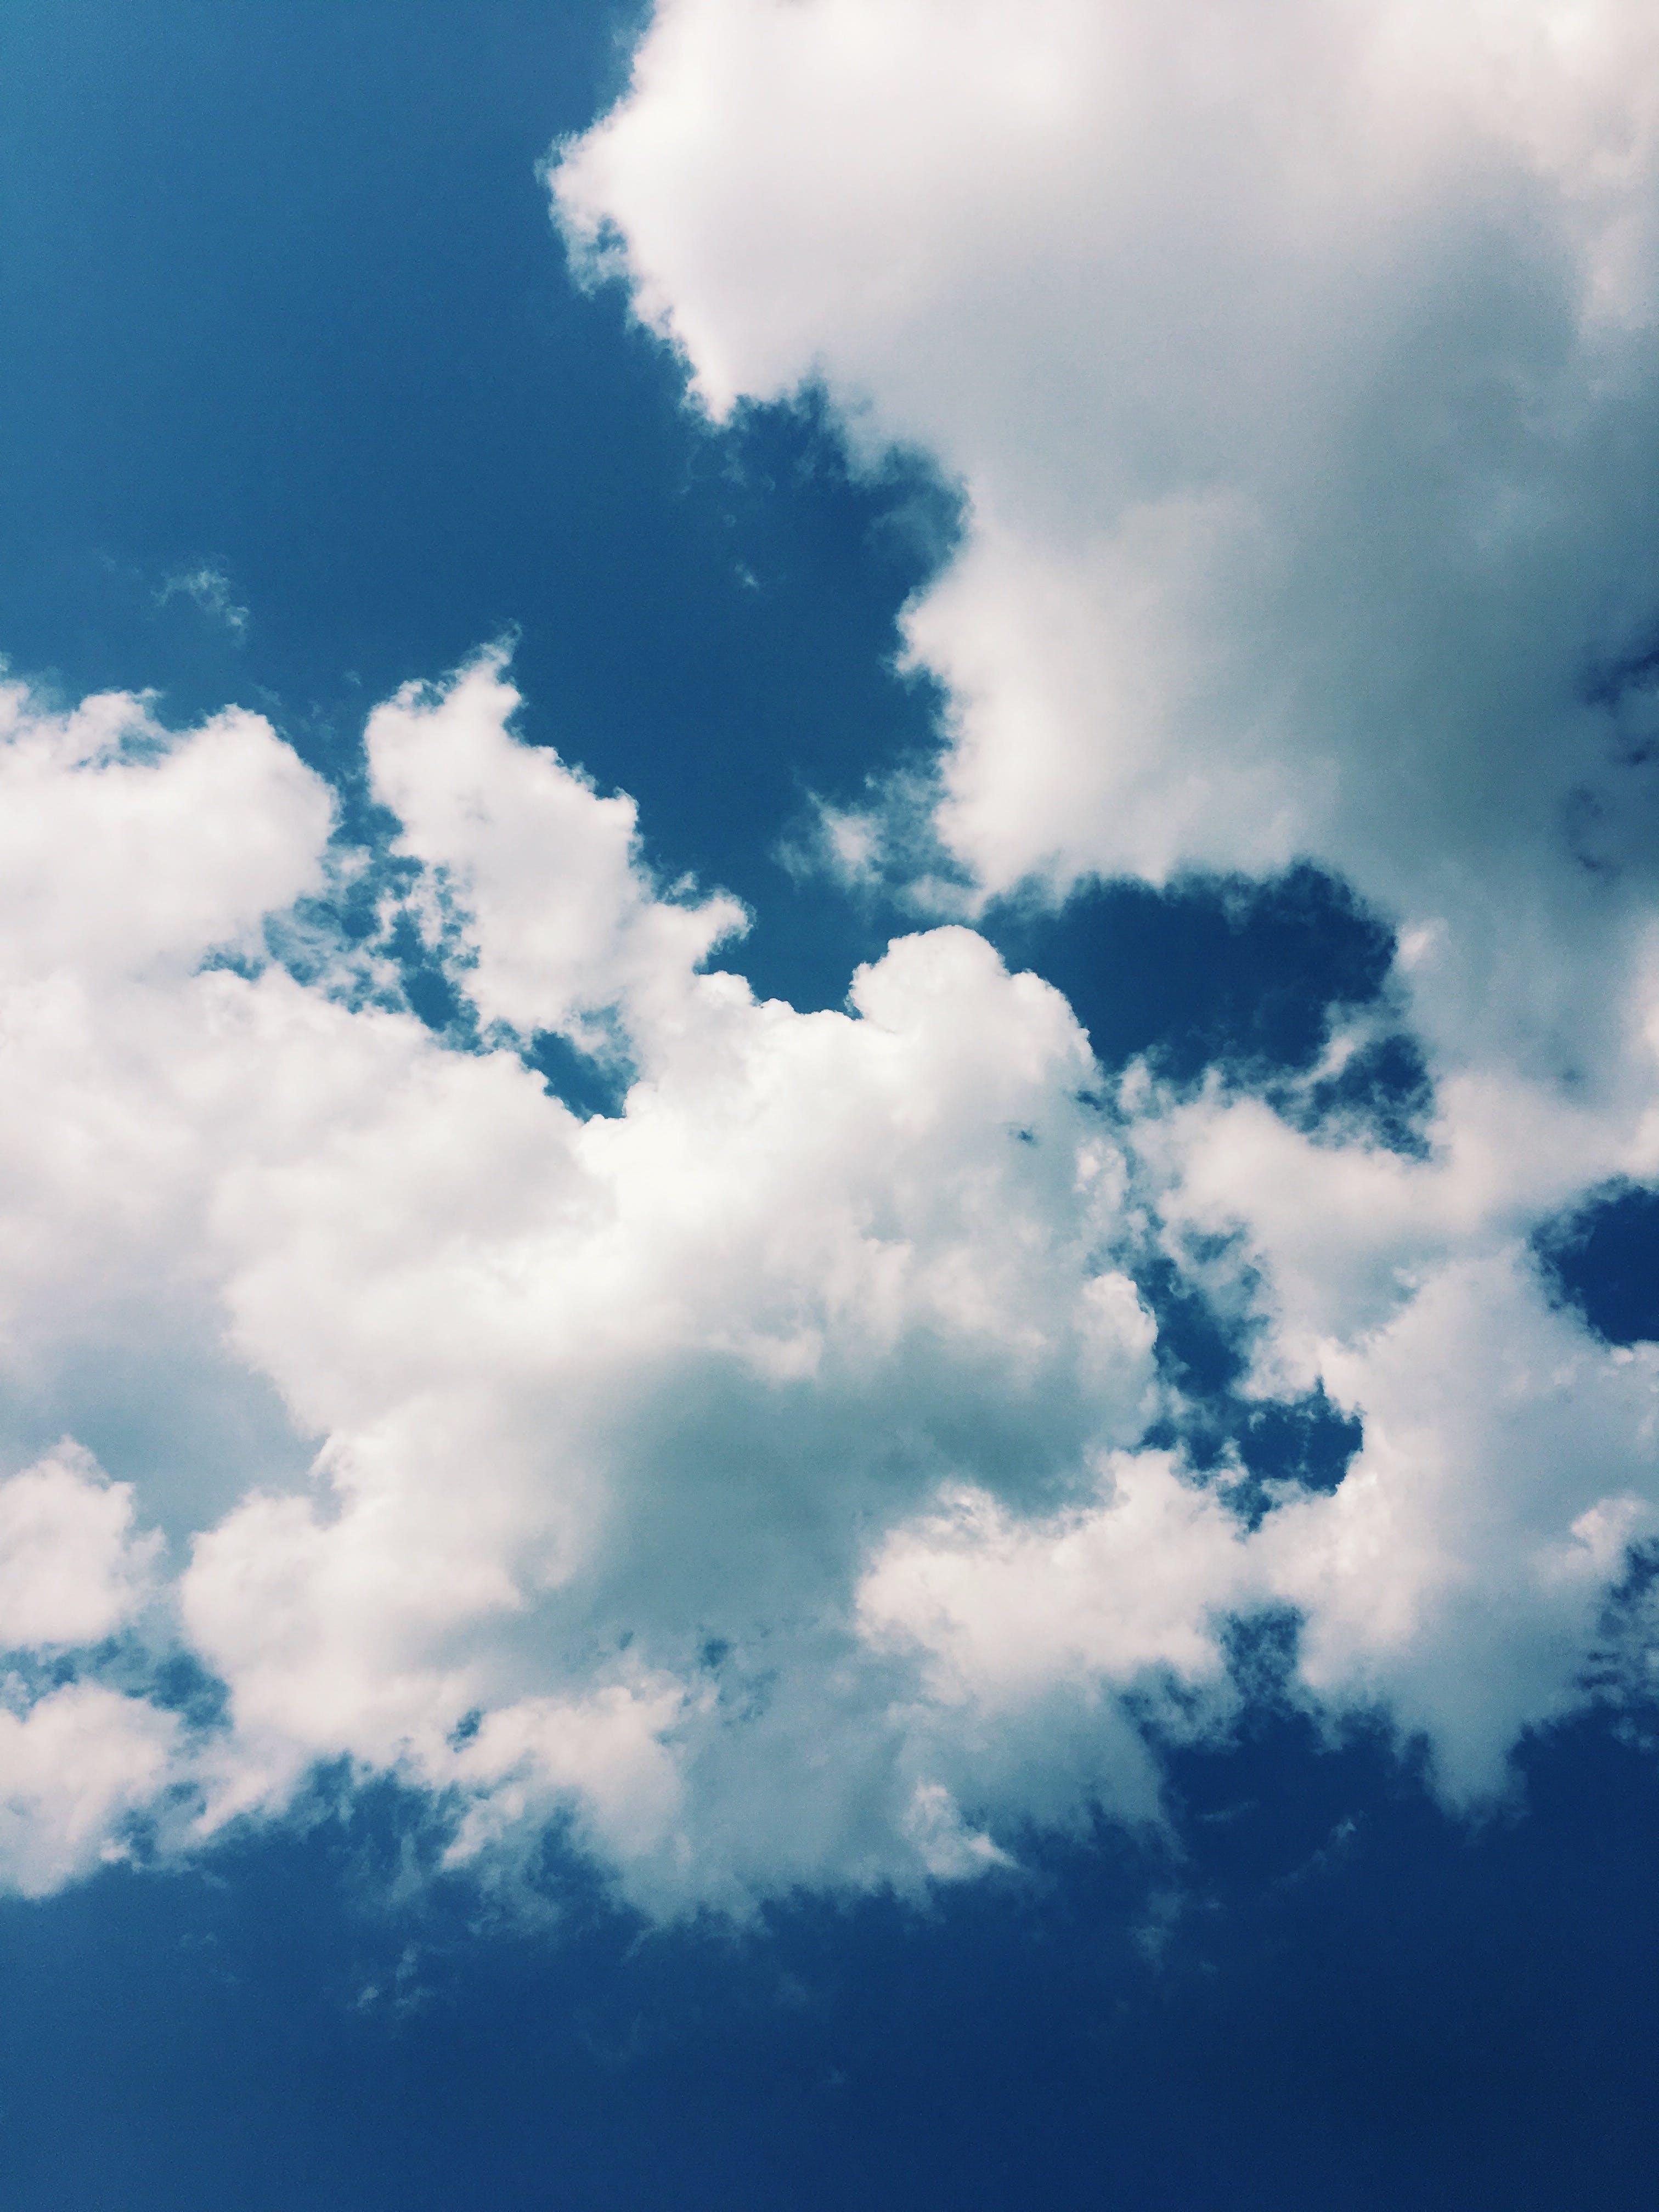 Kostenloses Stock Foto zu bewölkter himmel, blauer himmel, bunt, dunkelblau